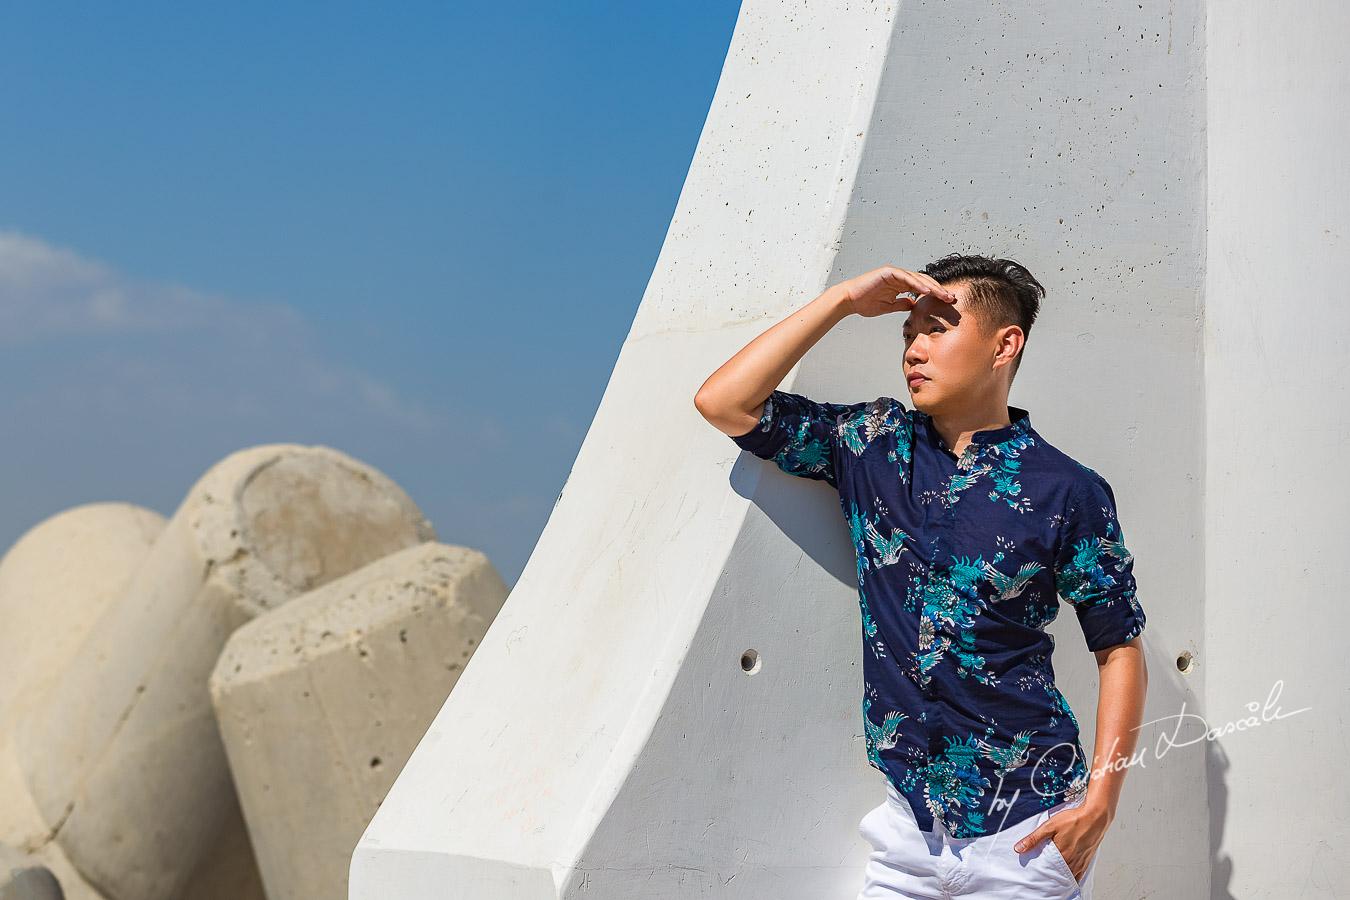 Song posing like a model in Zygi, Cyprus. Photographer: Cristian Dascalu